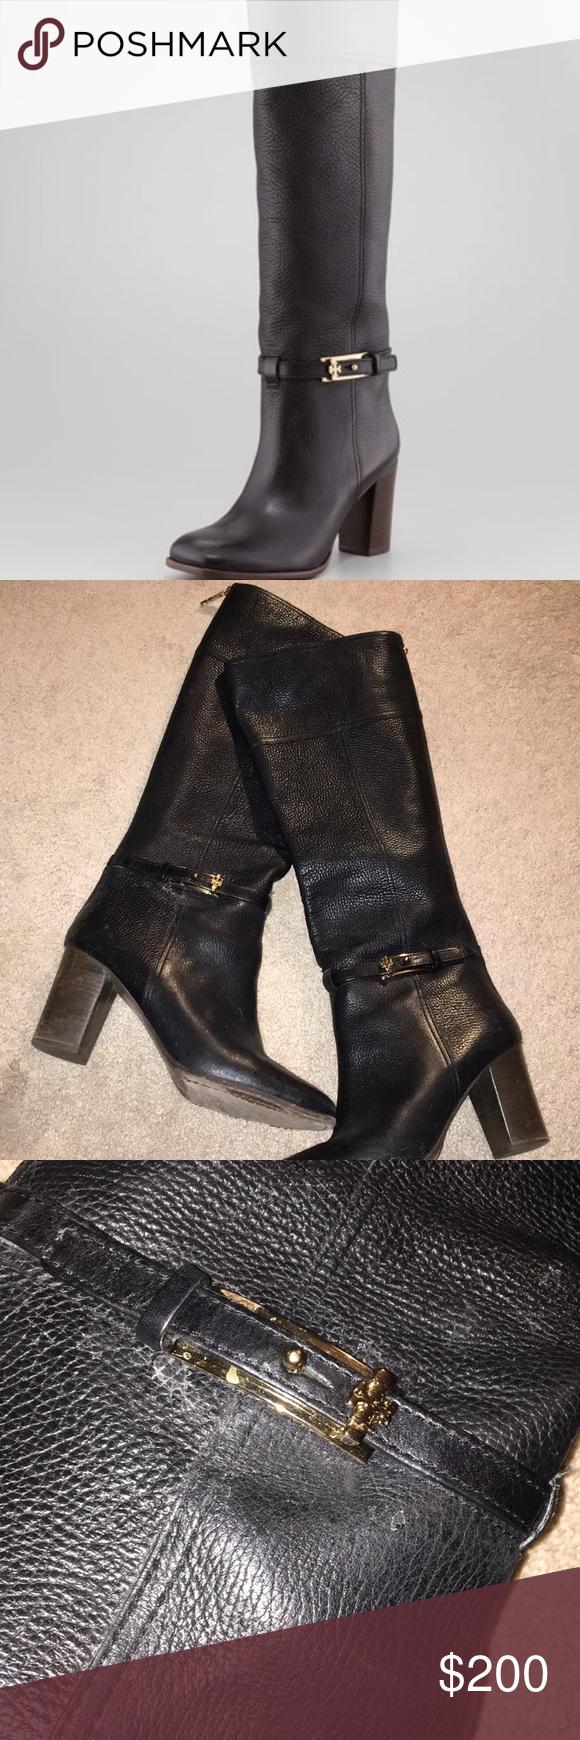 f9a0dfc994e7 Tory Burch Jenna Mid Heel Knee Boot Great shape